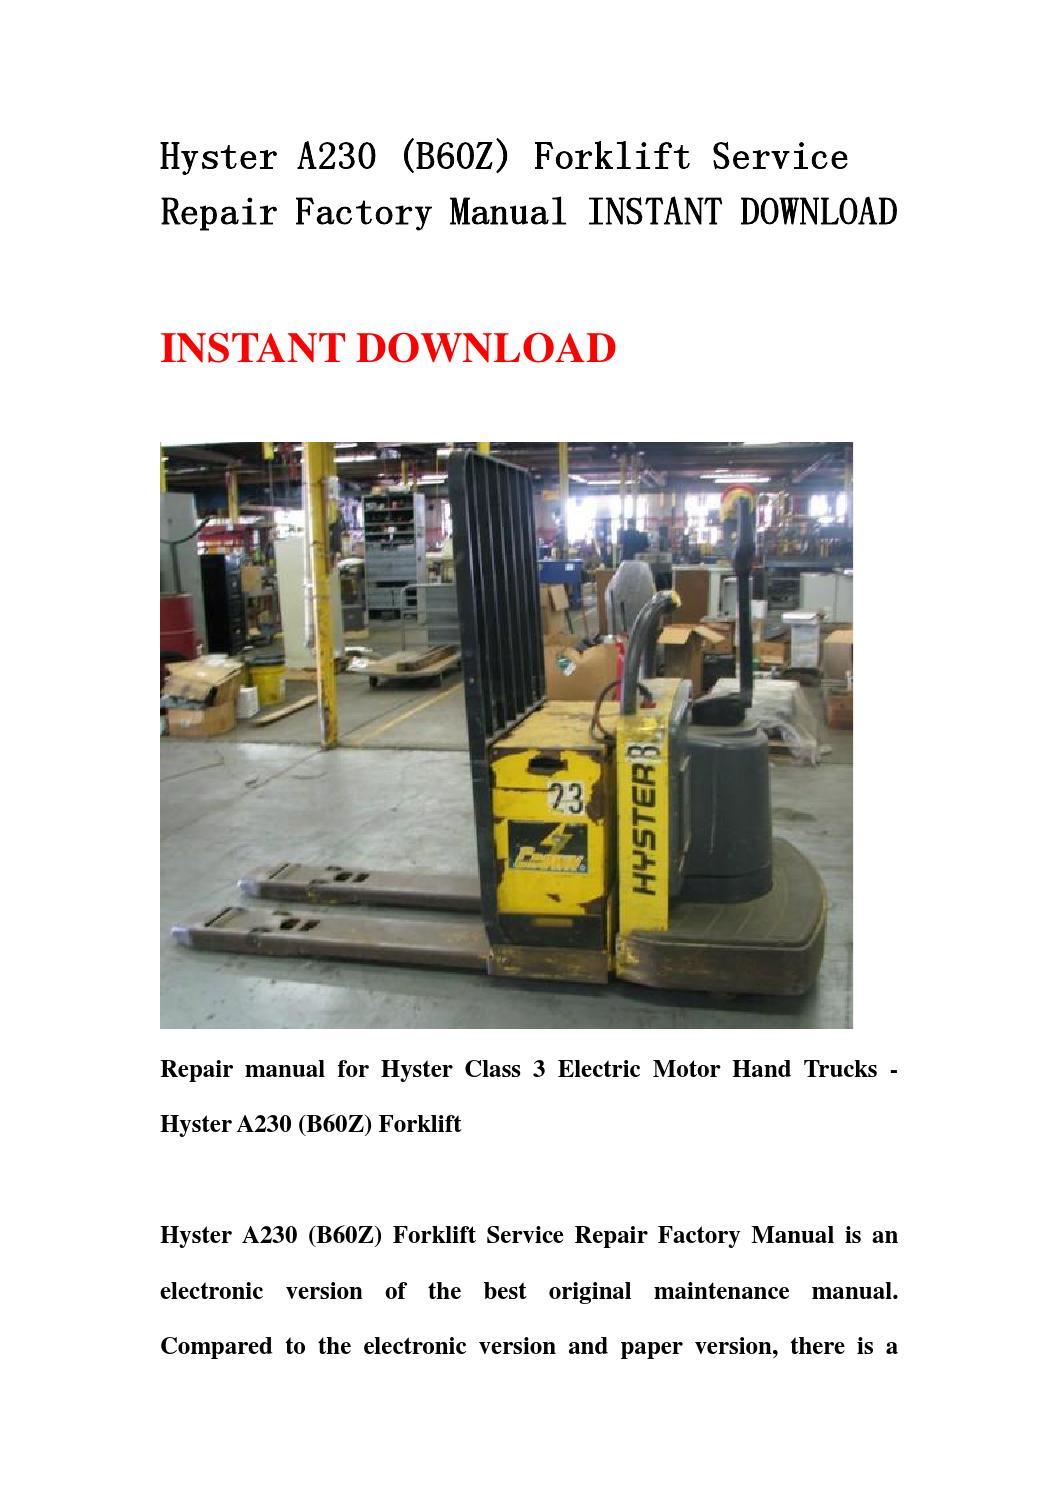 hyster 60 forklift wiring diagram vlan design a230 b60z service repair factory manual